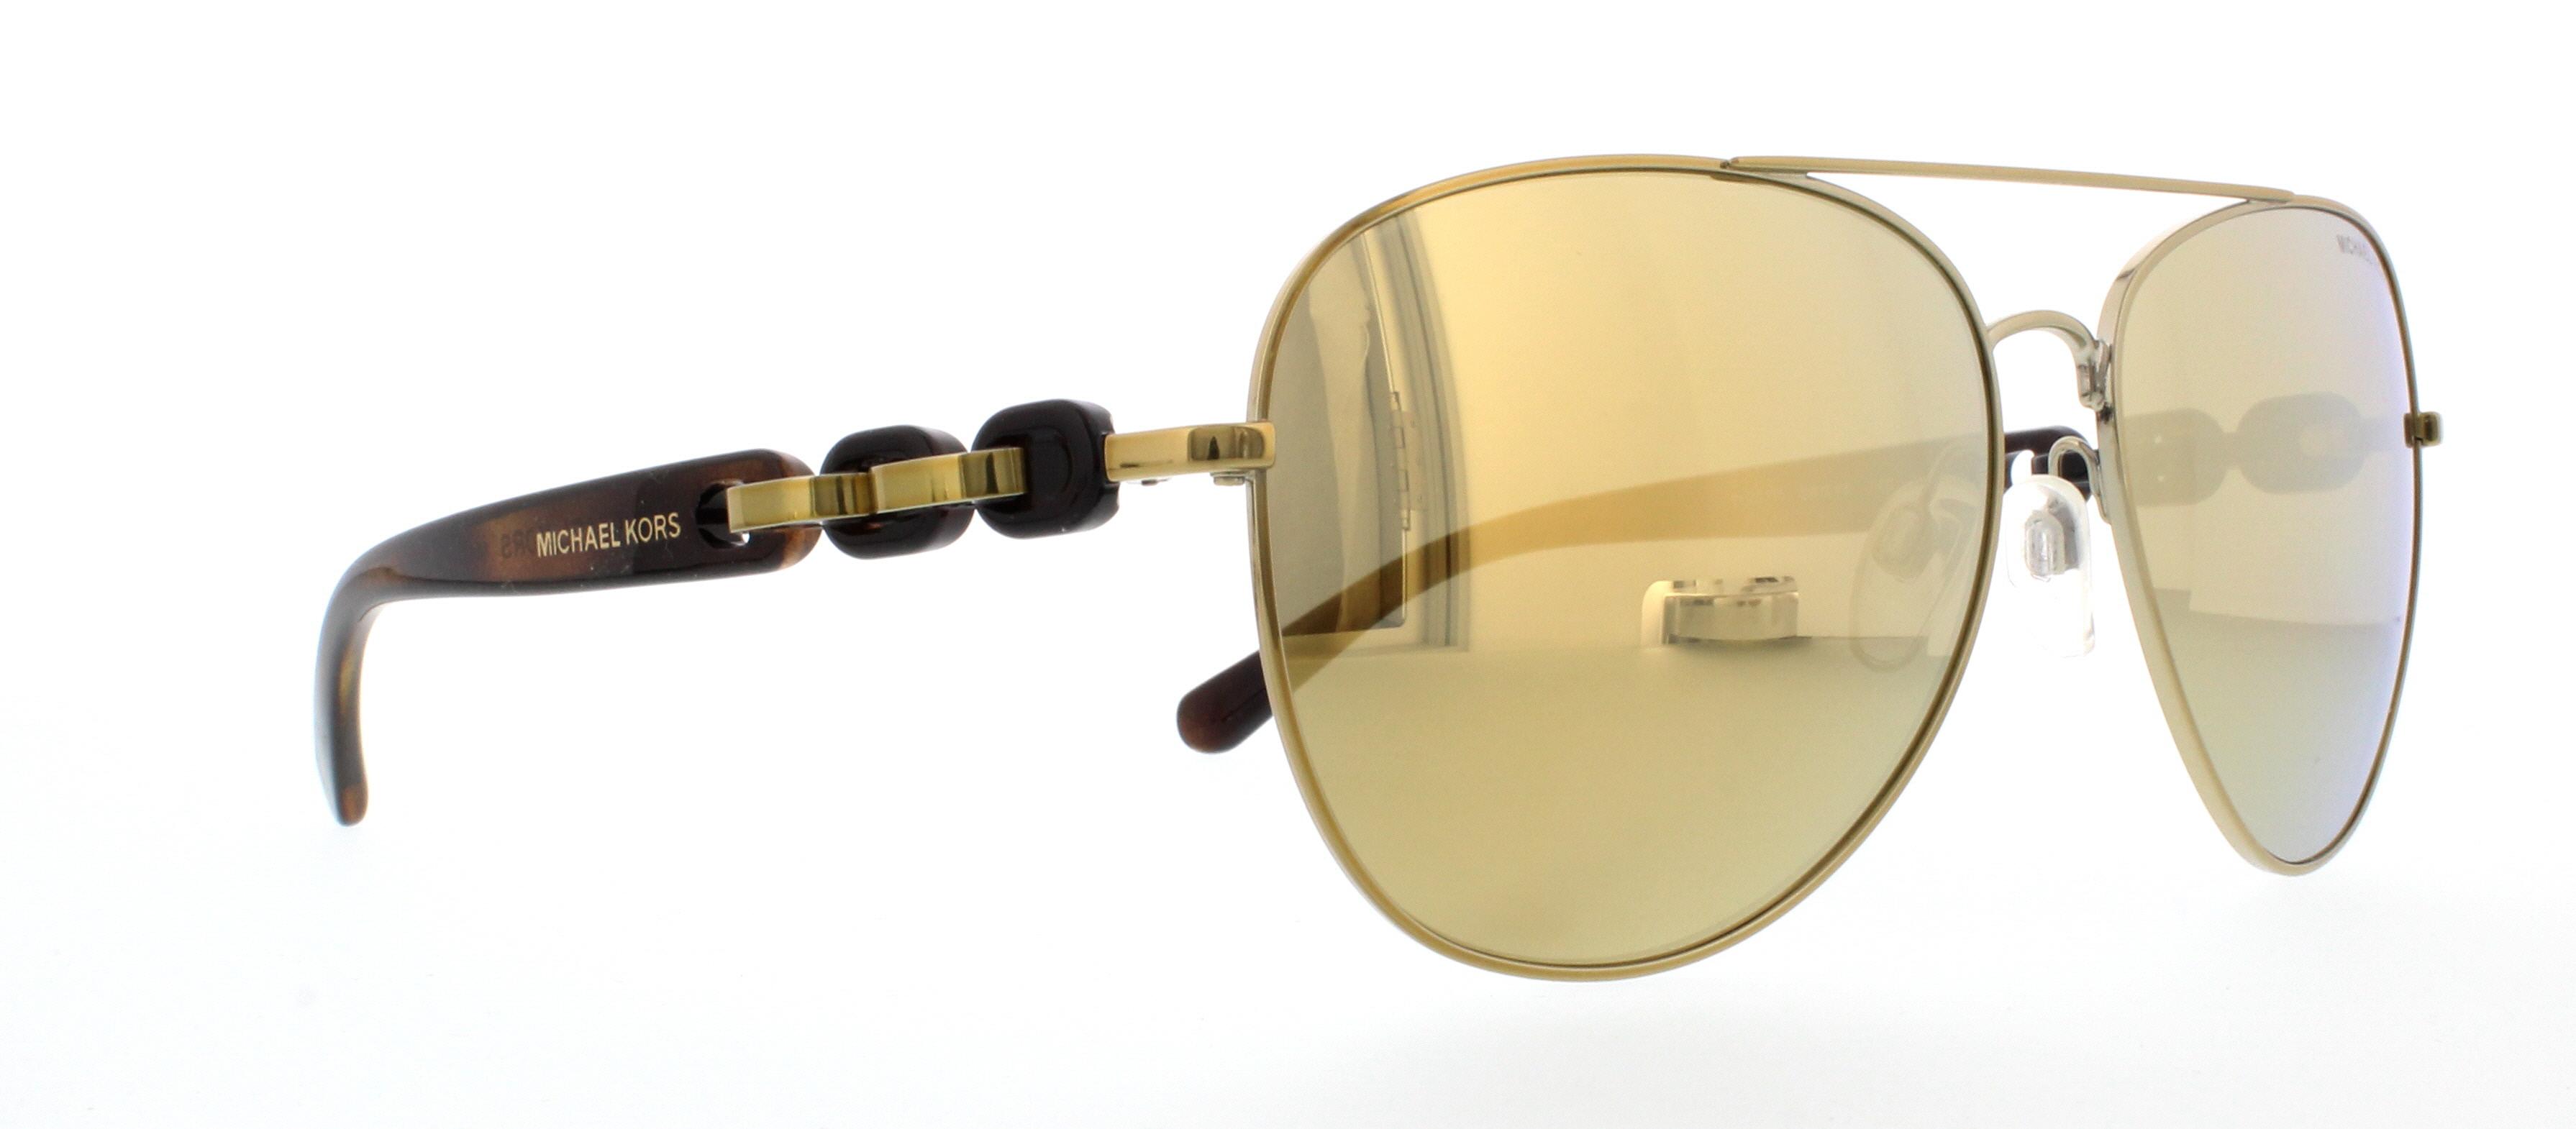 Michael Kors Pandora Sonnenbrille Gold 11297P 58mm P1HUSe